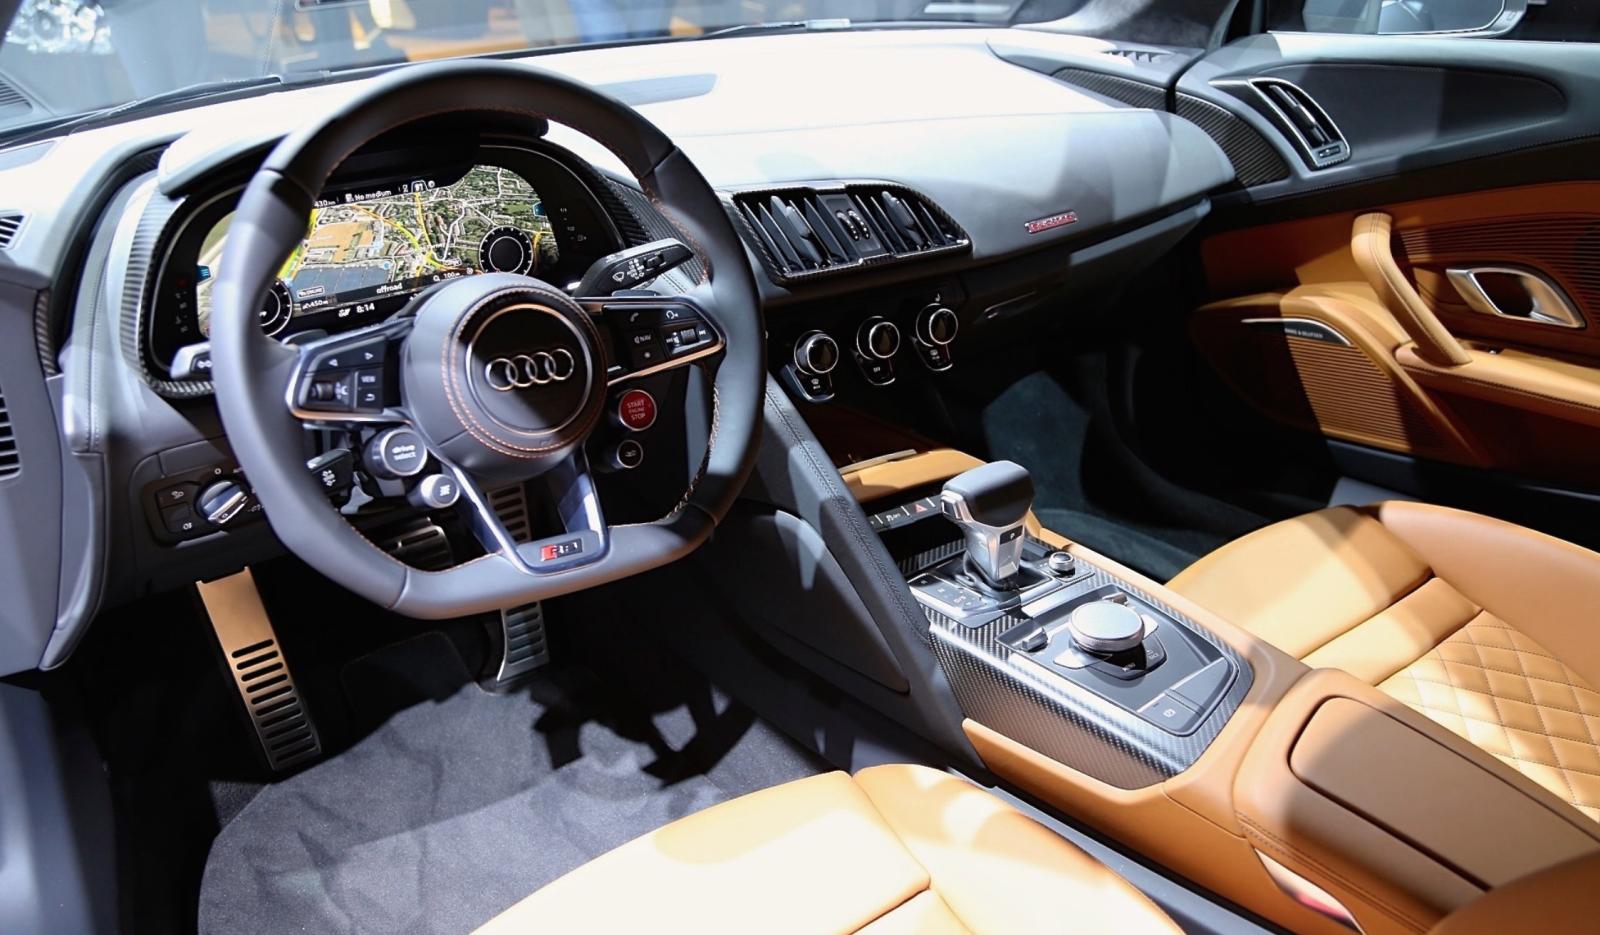 audi car tron drive and info s reviews news photos driver e new review photo first original